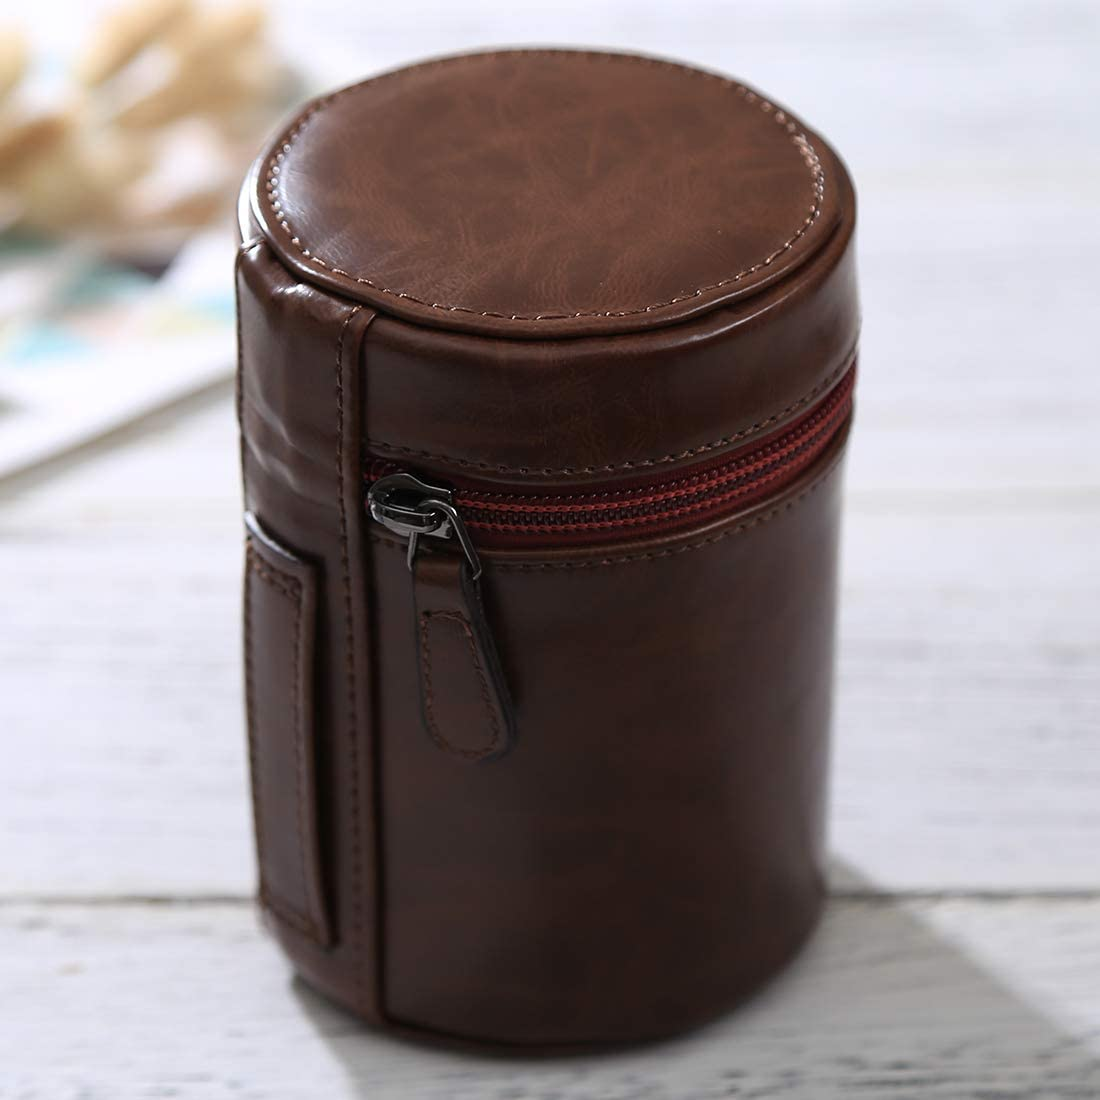 Caofeng lens case Pouch Medium Lens Case Zippered PU Leather Pouch Box for DSLR Camera Lens Black Color : Coffee Size: 13x9x9cm